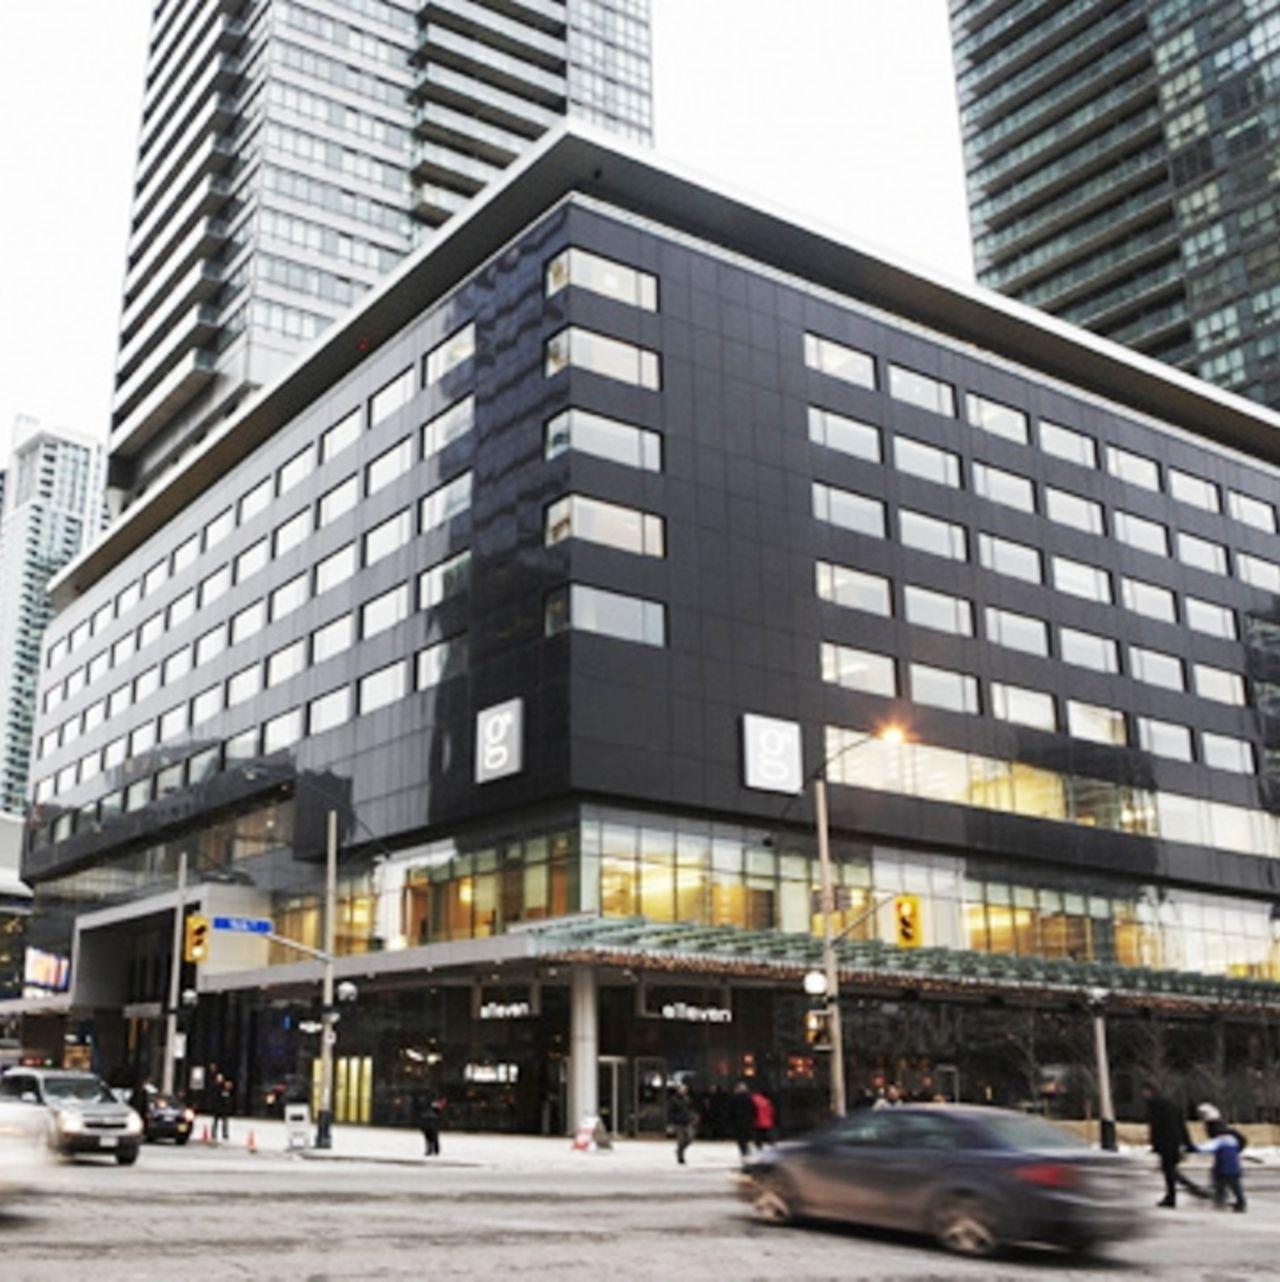 Hotel Le Germain Maple Leaf Square Restaurant